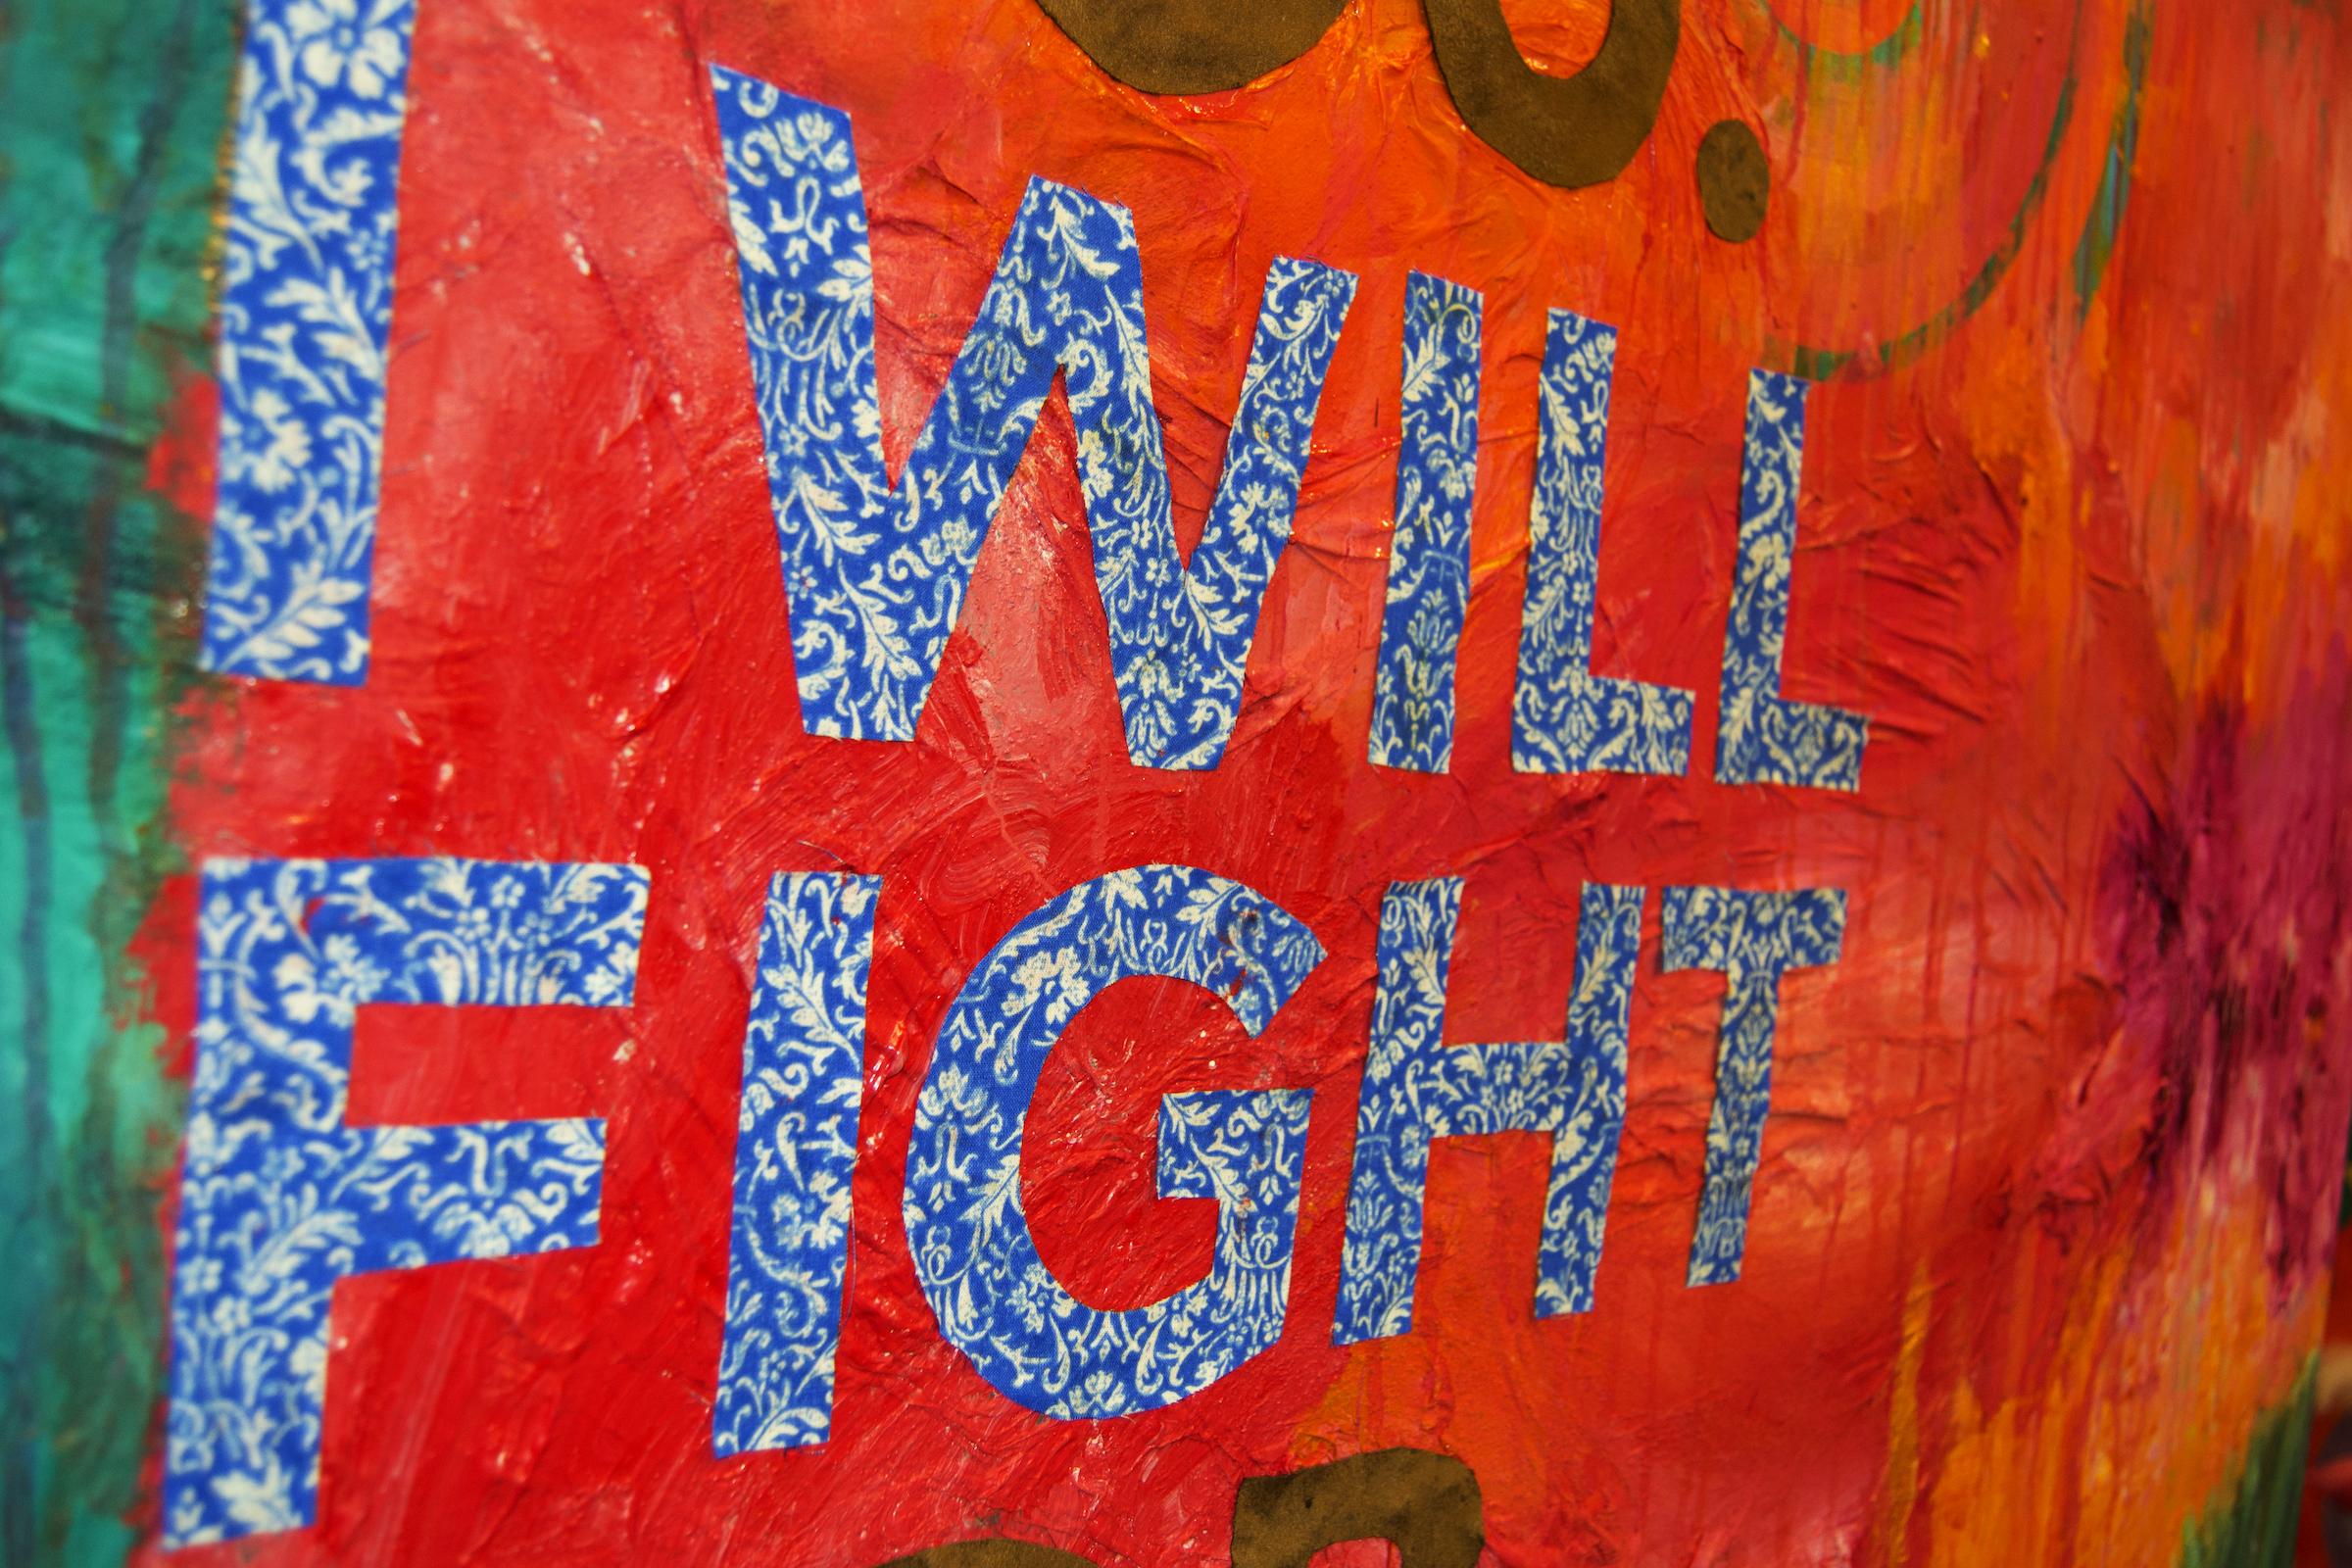 aliana grace bailey artist fight i will.png